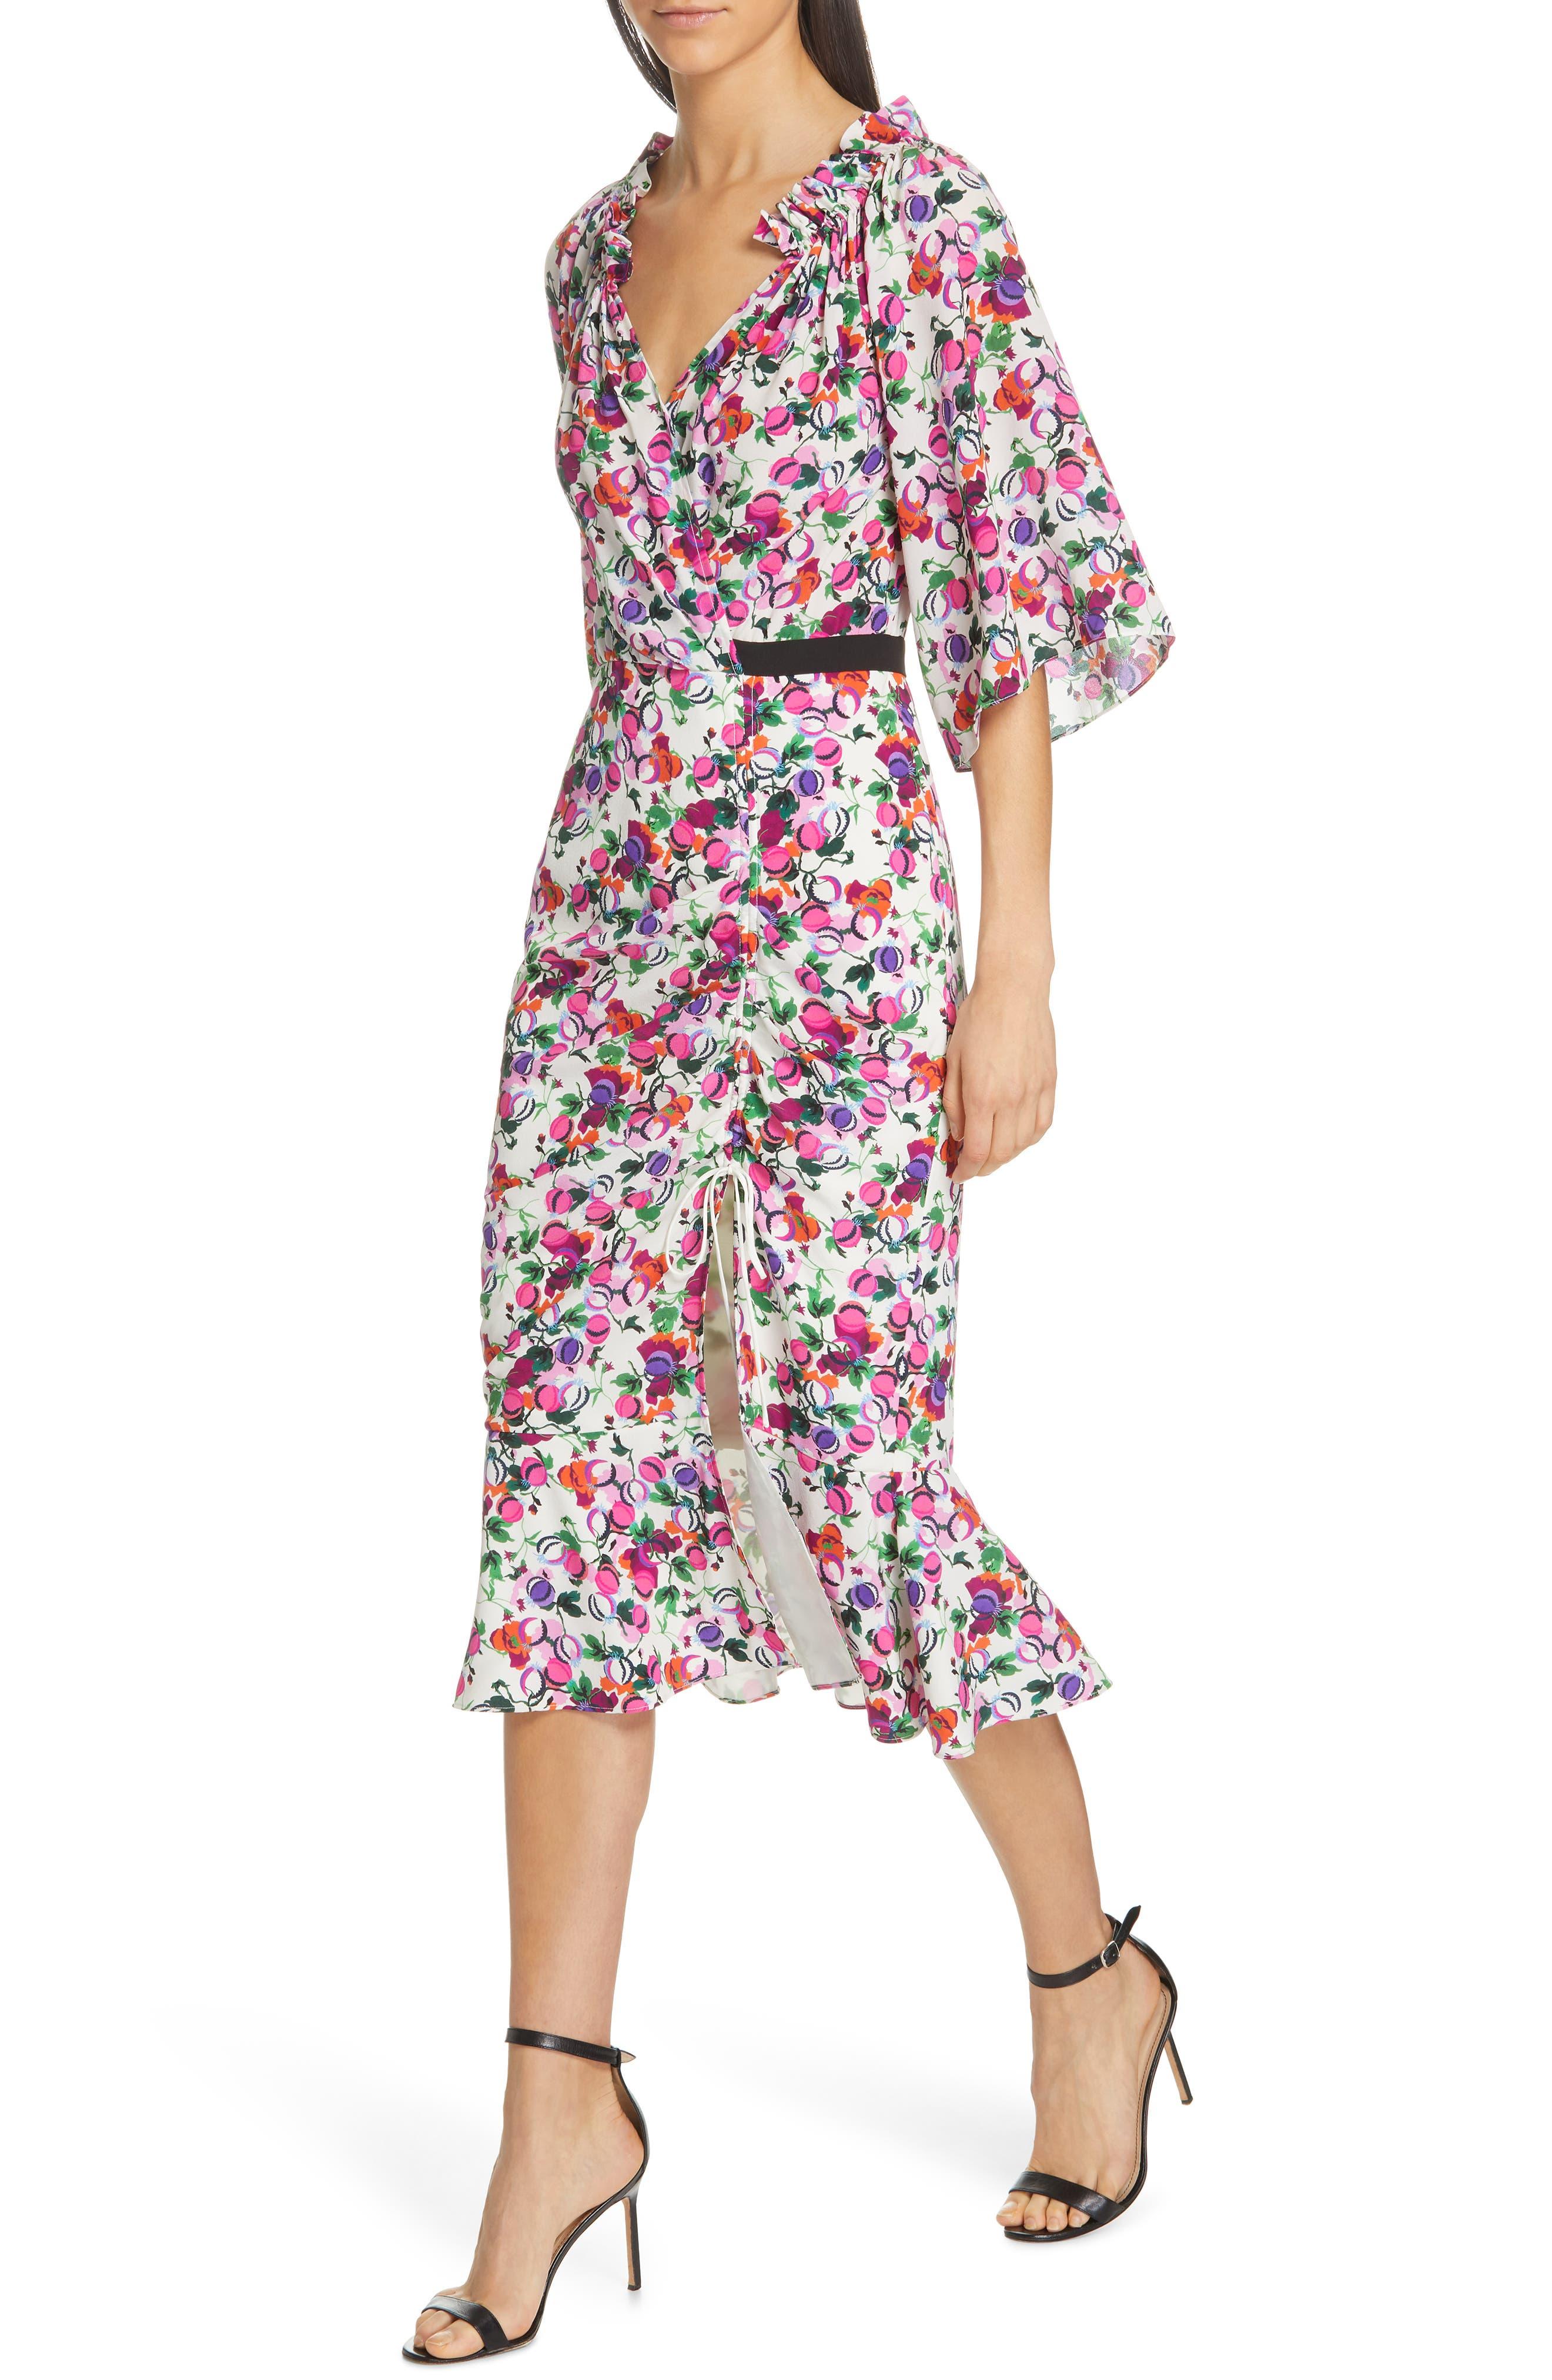 SALONI, Olivia Floral Print Off the Shoulder Midi Dress, Alternate thumbnail 4, color, ROSE BOUNTY BLACK